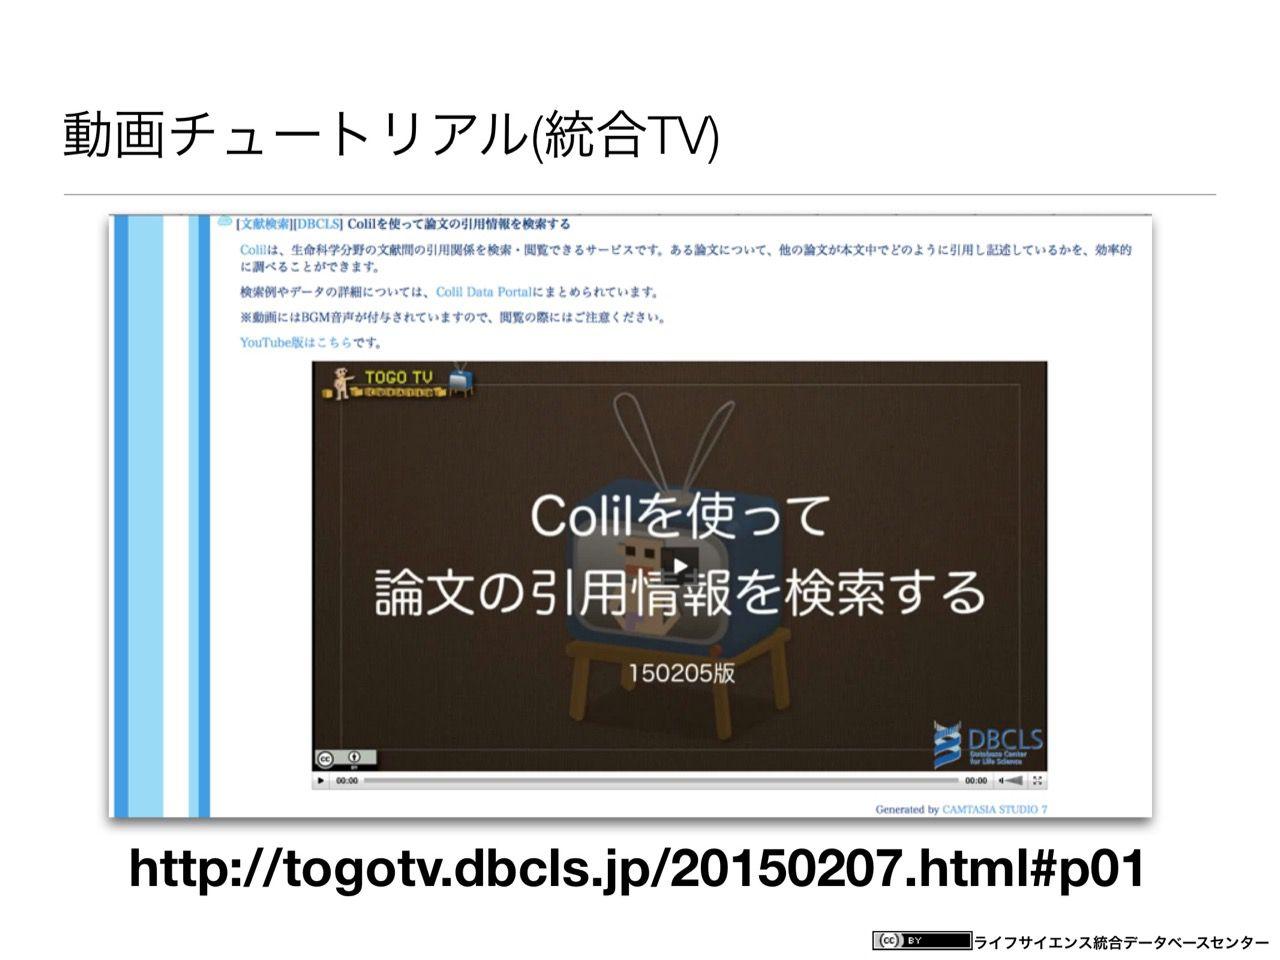 images/AJACS60_yamamoto_066.jpg